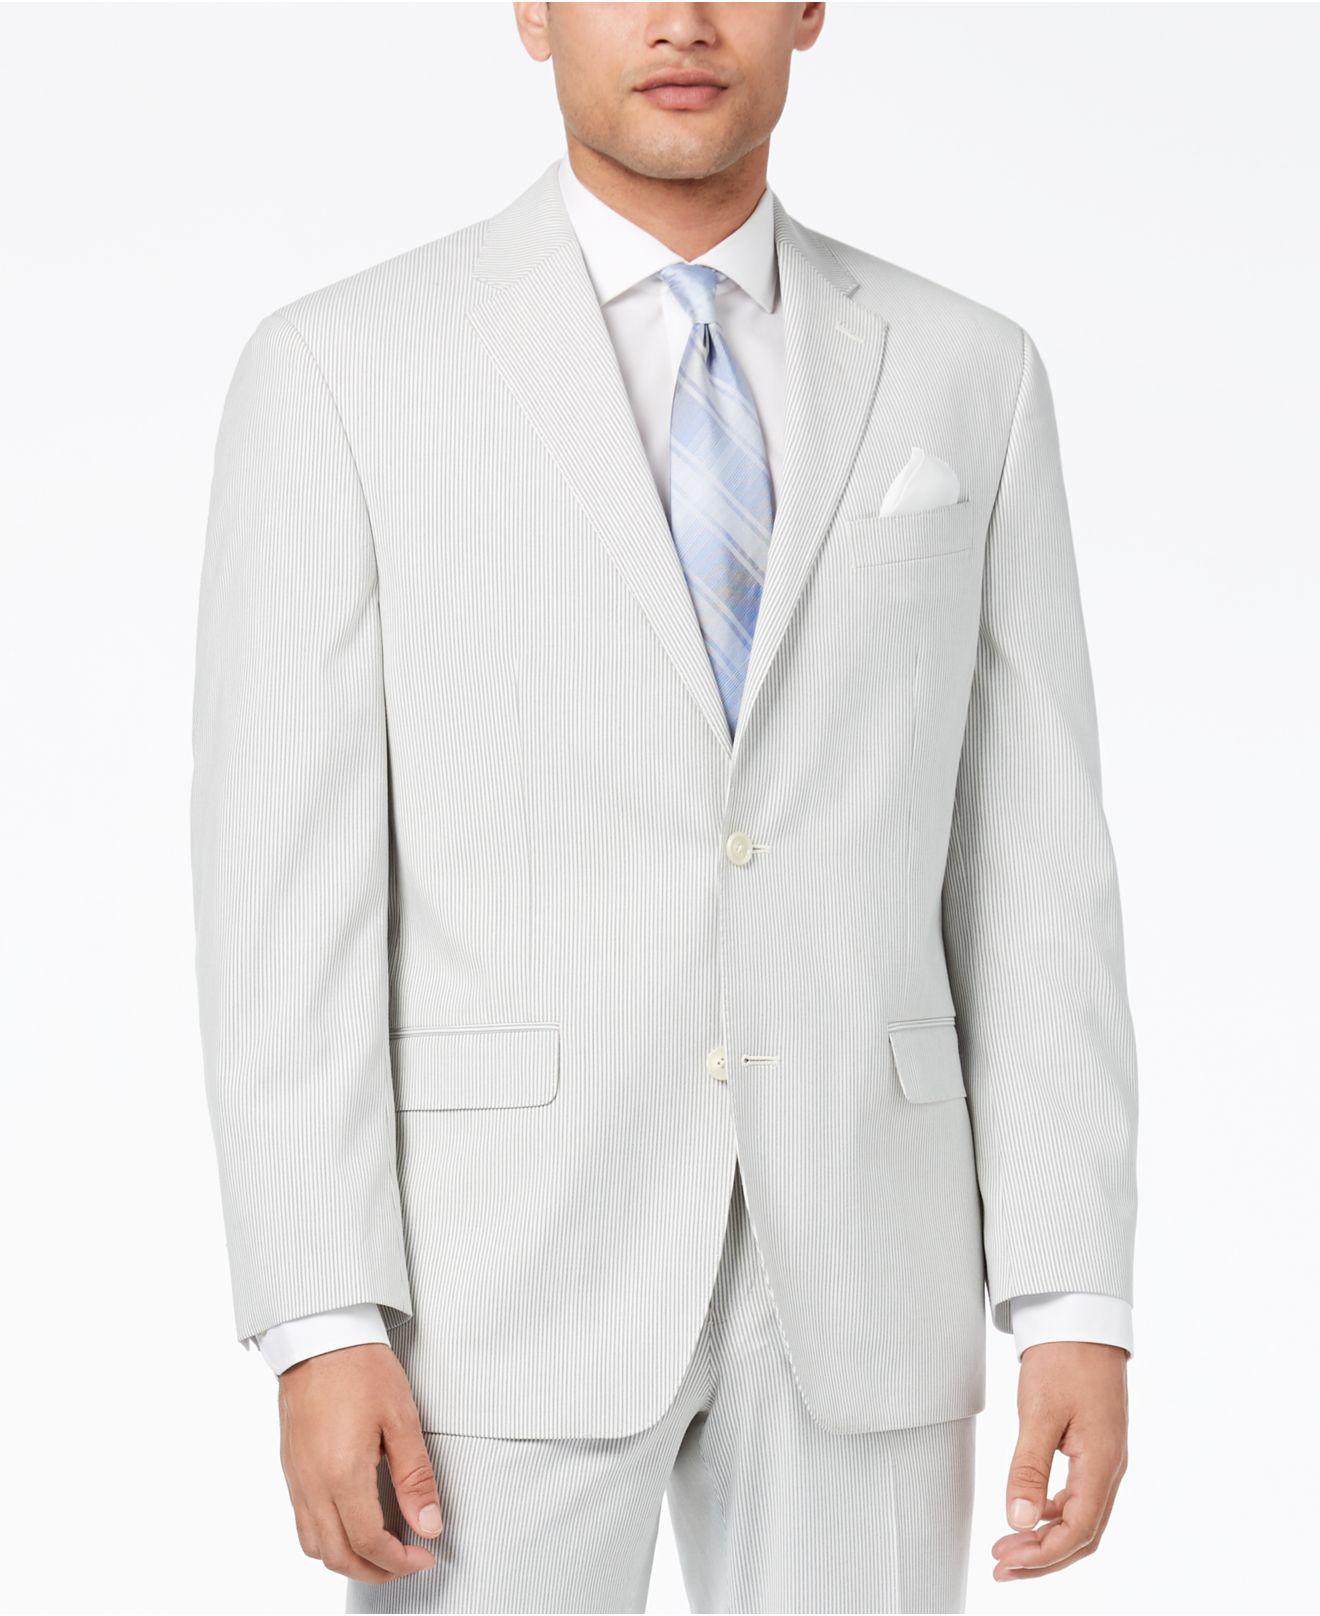 sean john classic fit stretch gray stripe seersucker suit jacket in gray for men lyst. Black Bedroom Furniture Sets. Home Design Ideas